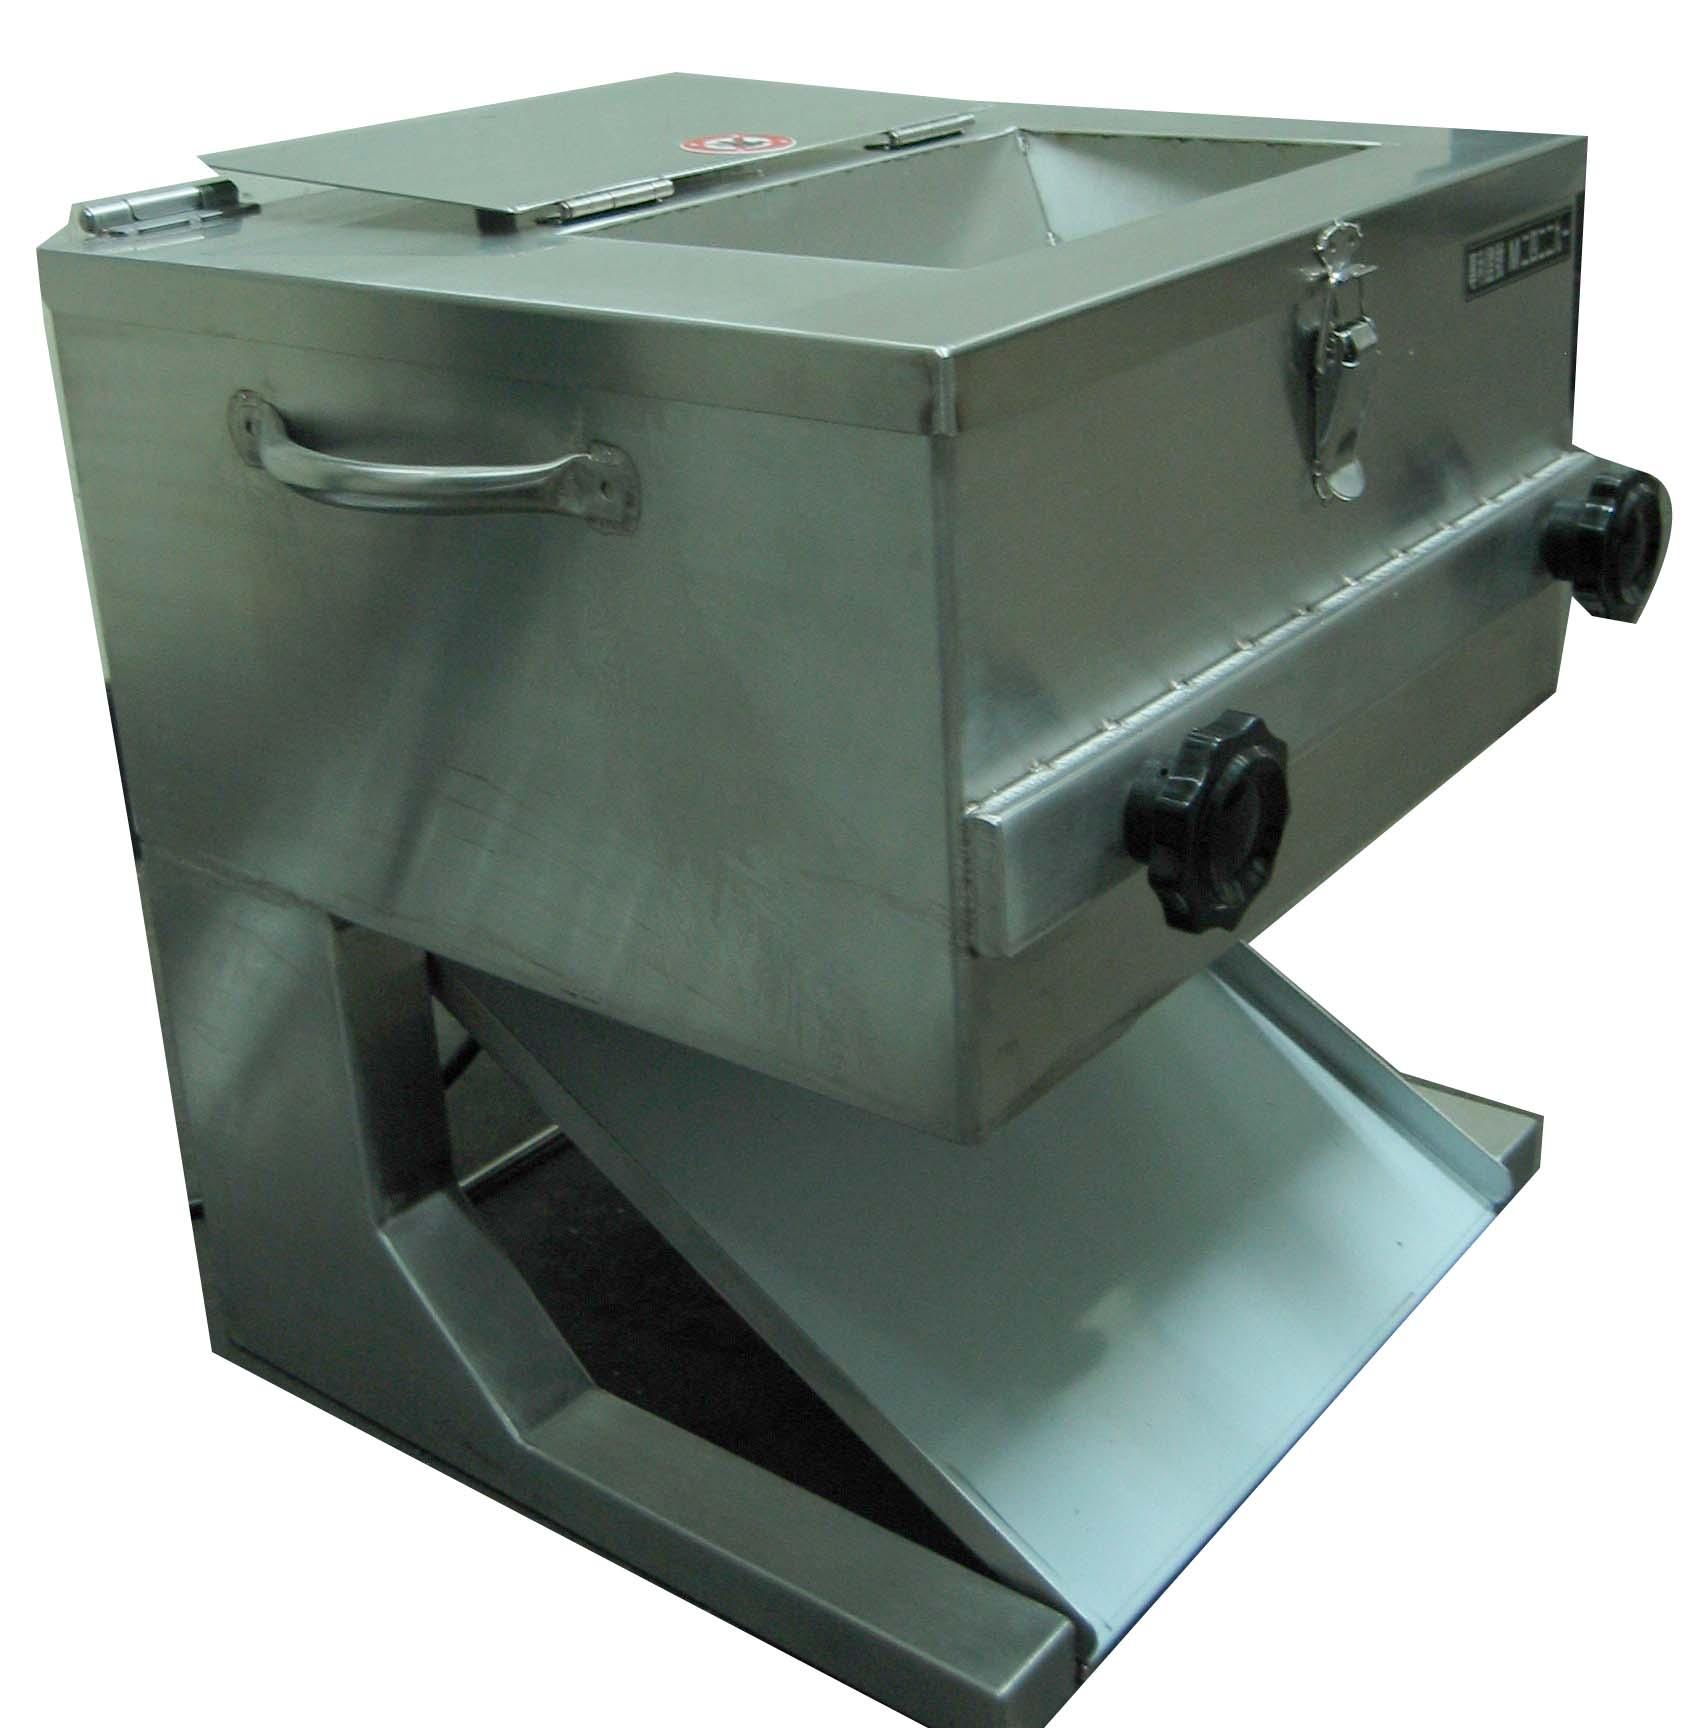 Warm Meat Slicing Machine Food Processing Equipment